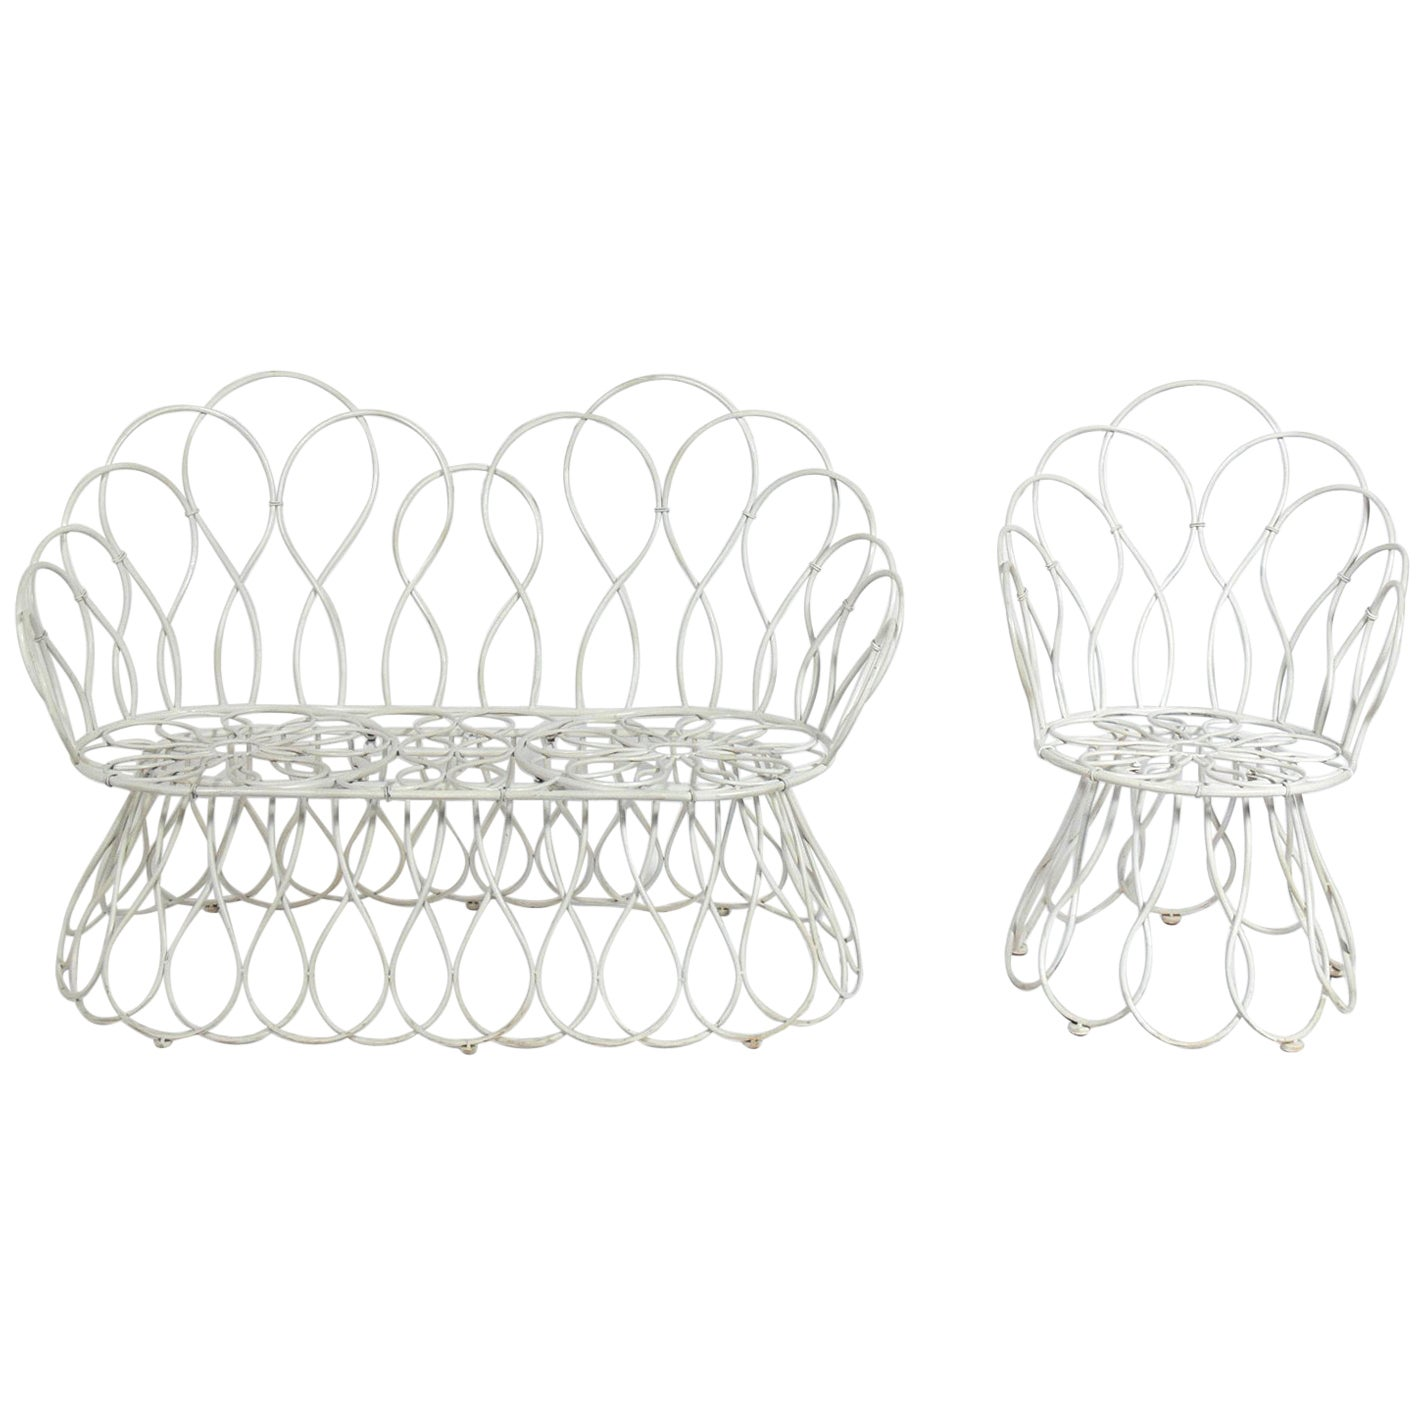 Sculptural Loop Settee and Chair in the Manner of Frances Elkins